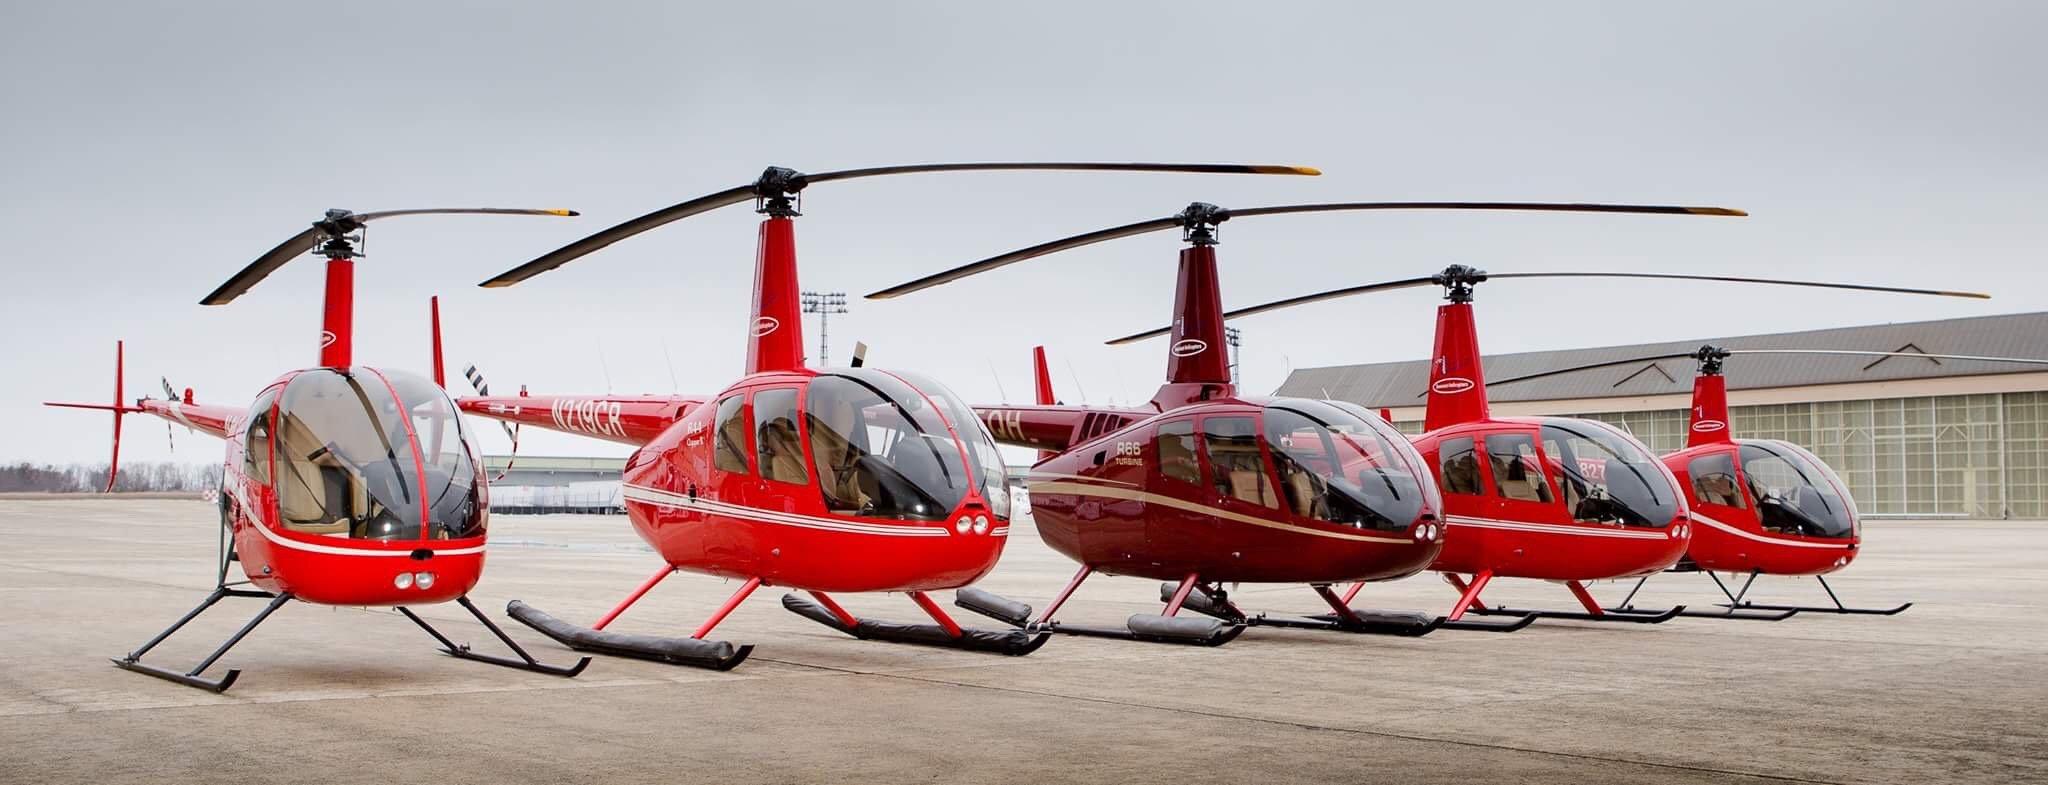 Seacoast Helicopter Fleet